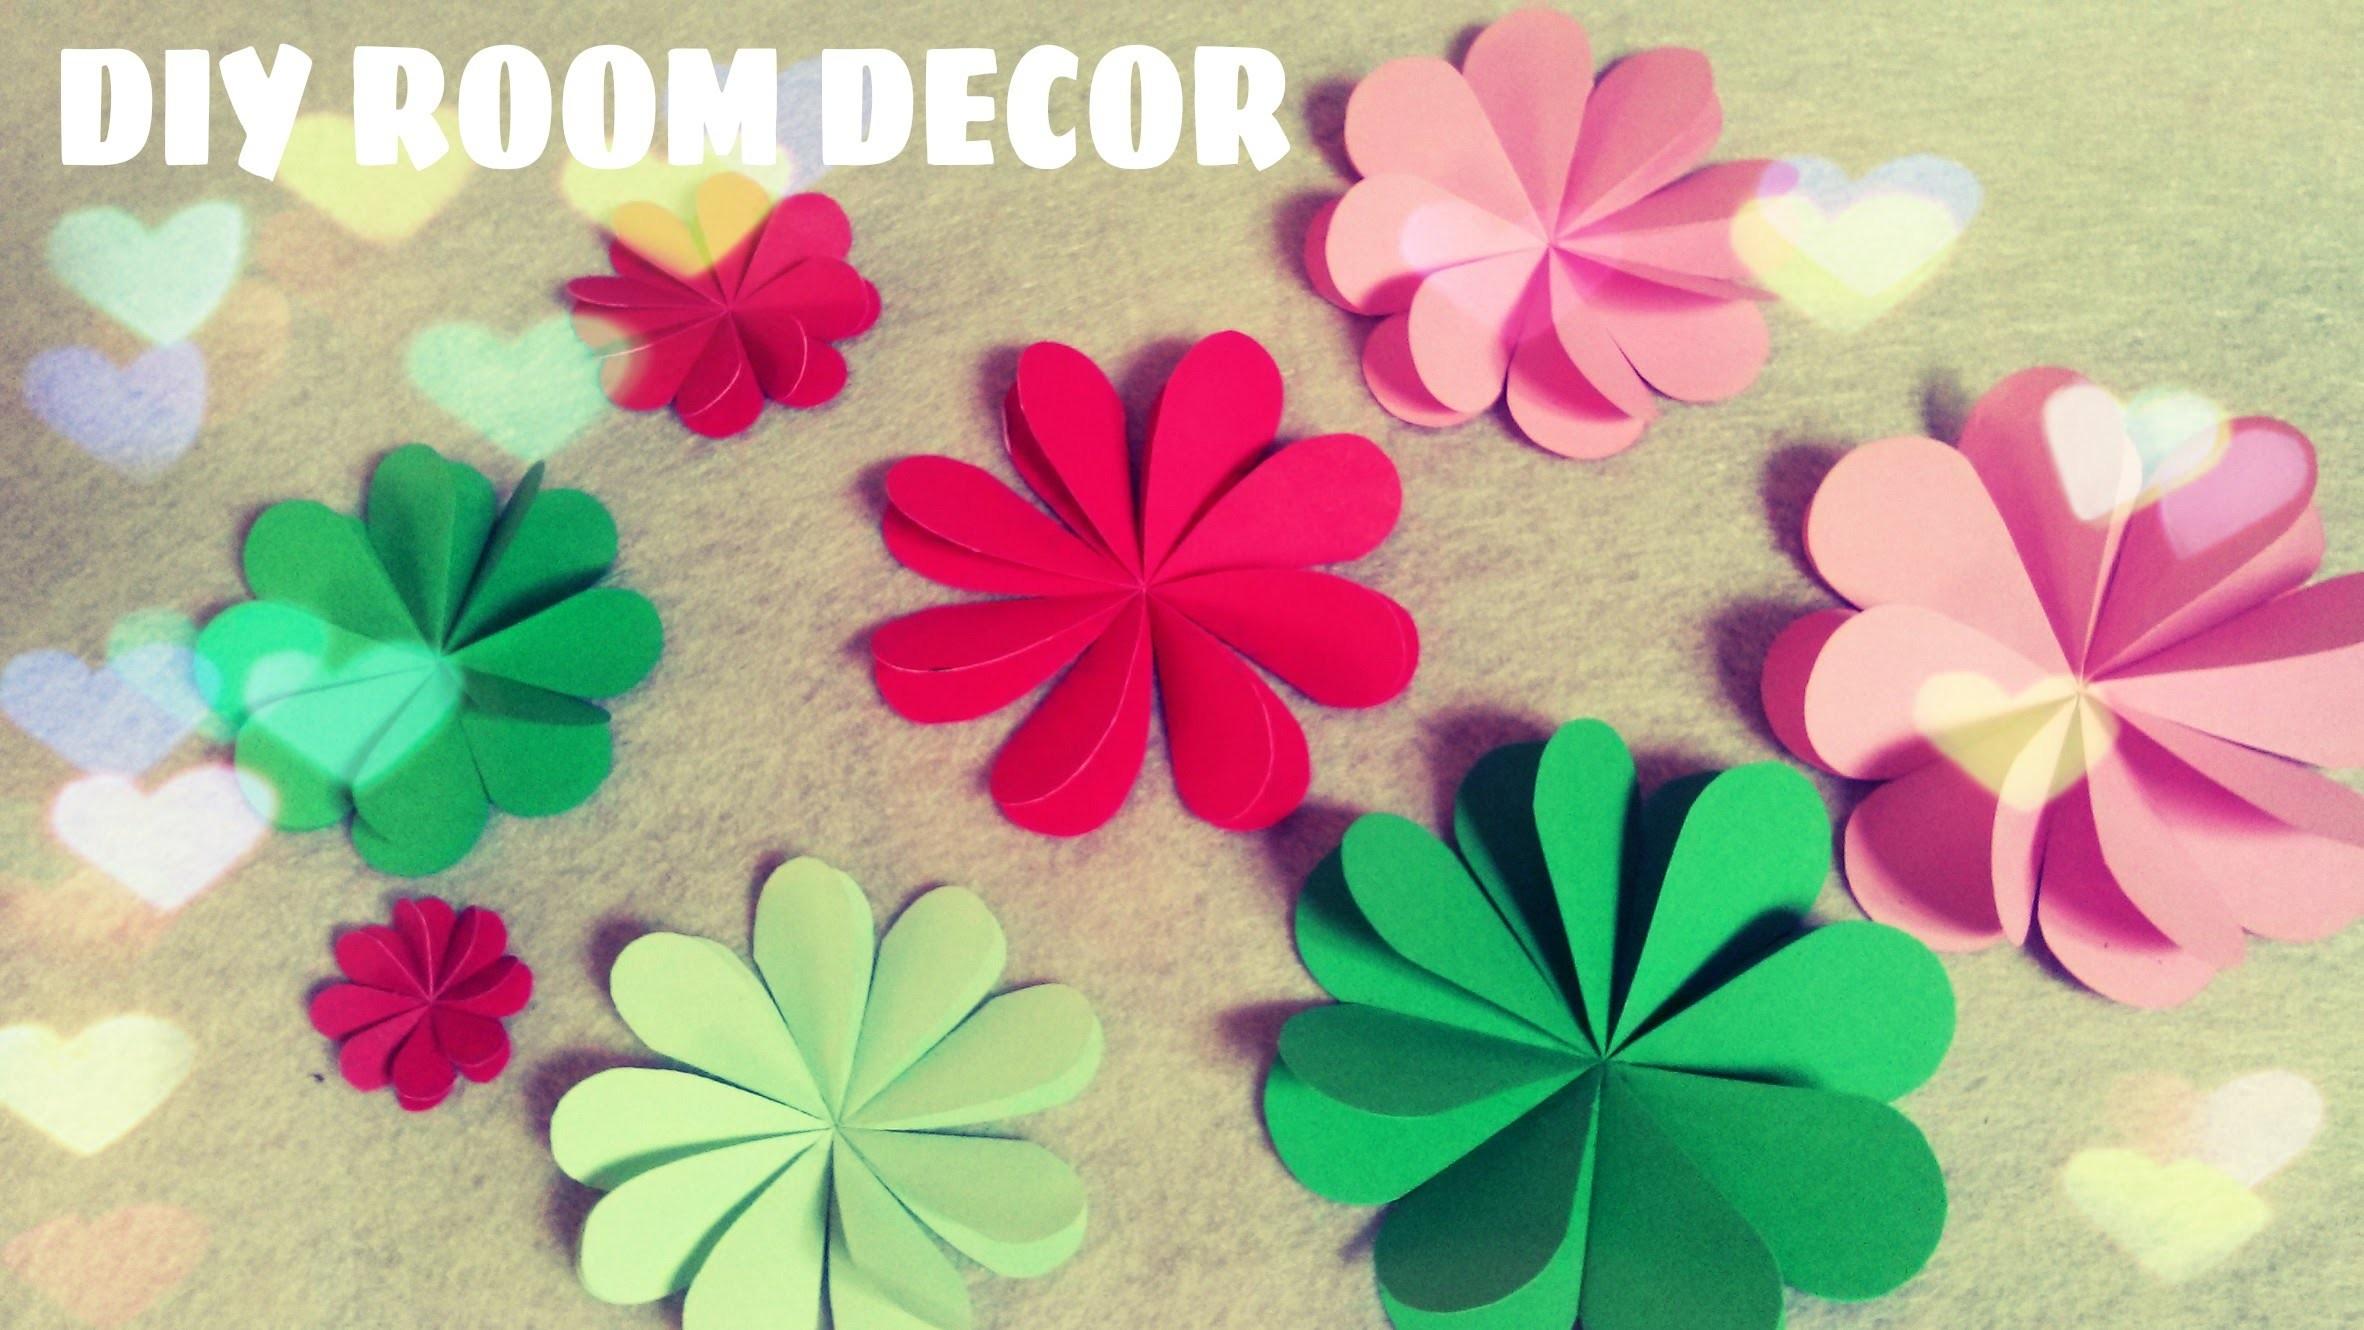 DIY Room Decor - Paper Flowers Tutorial (Easy)